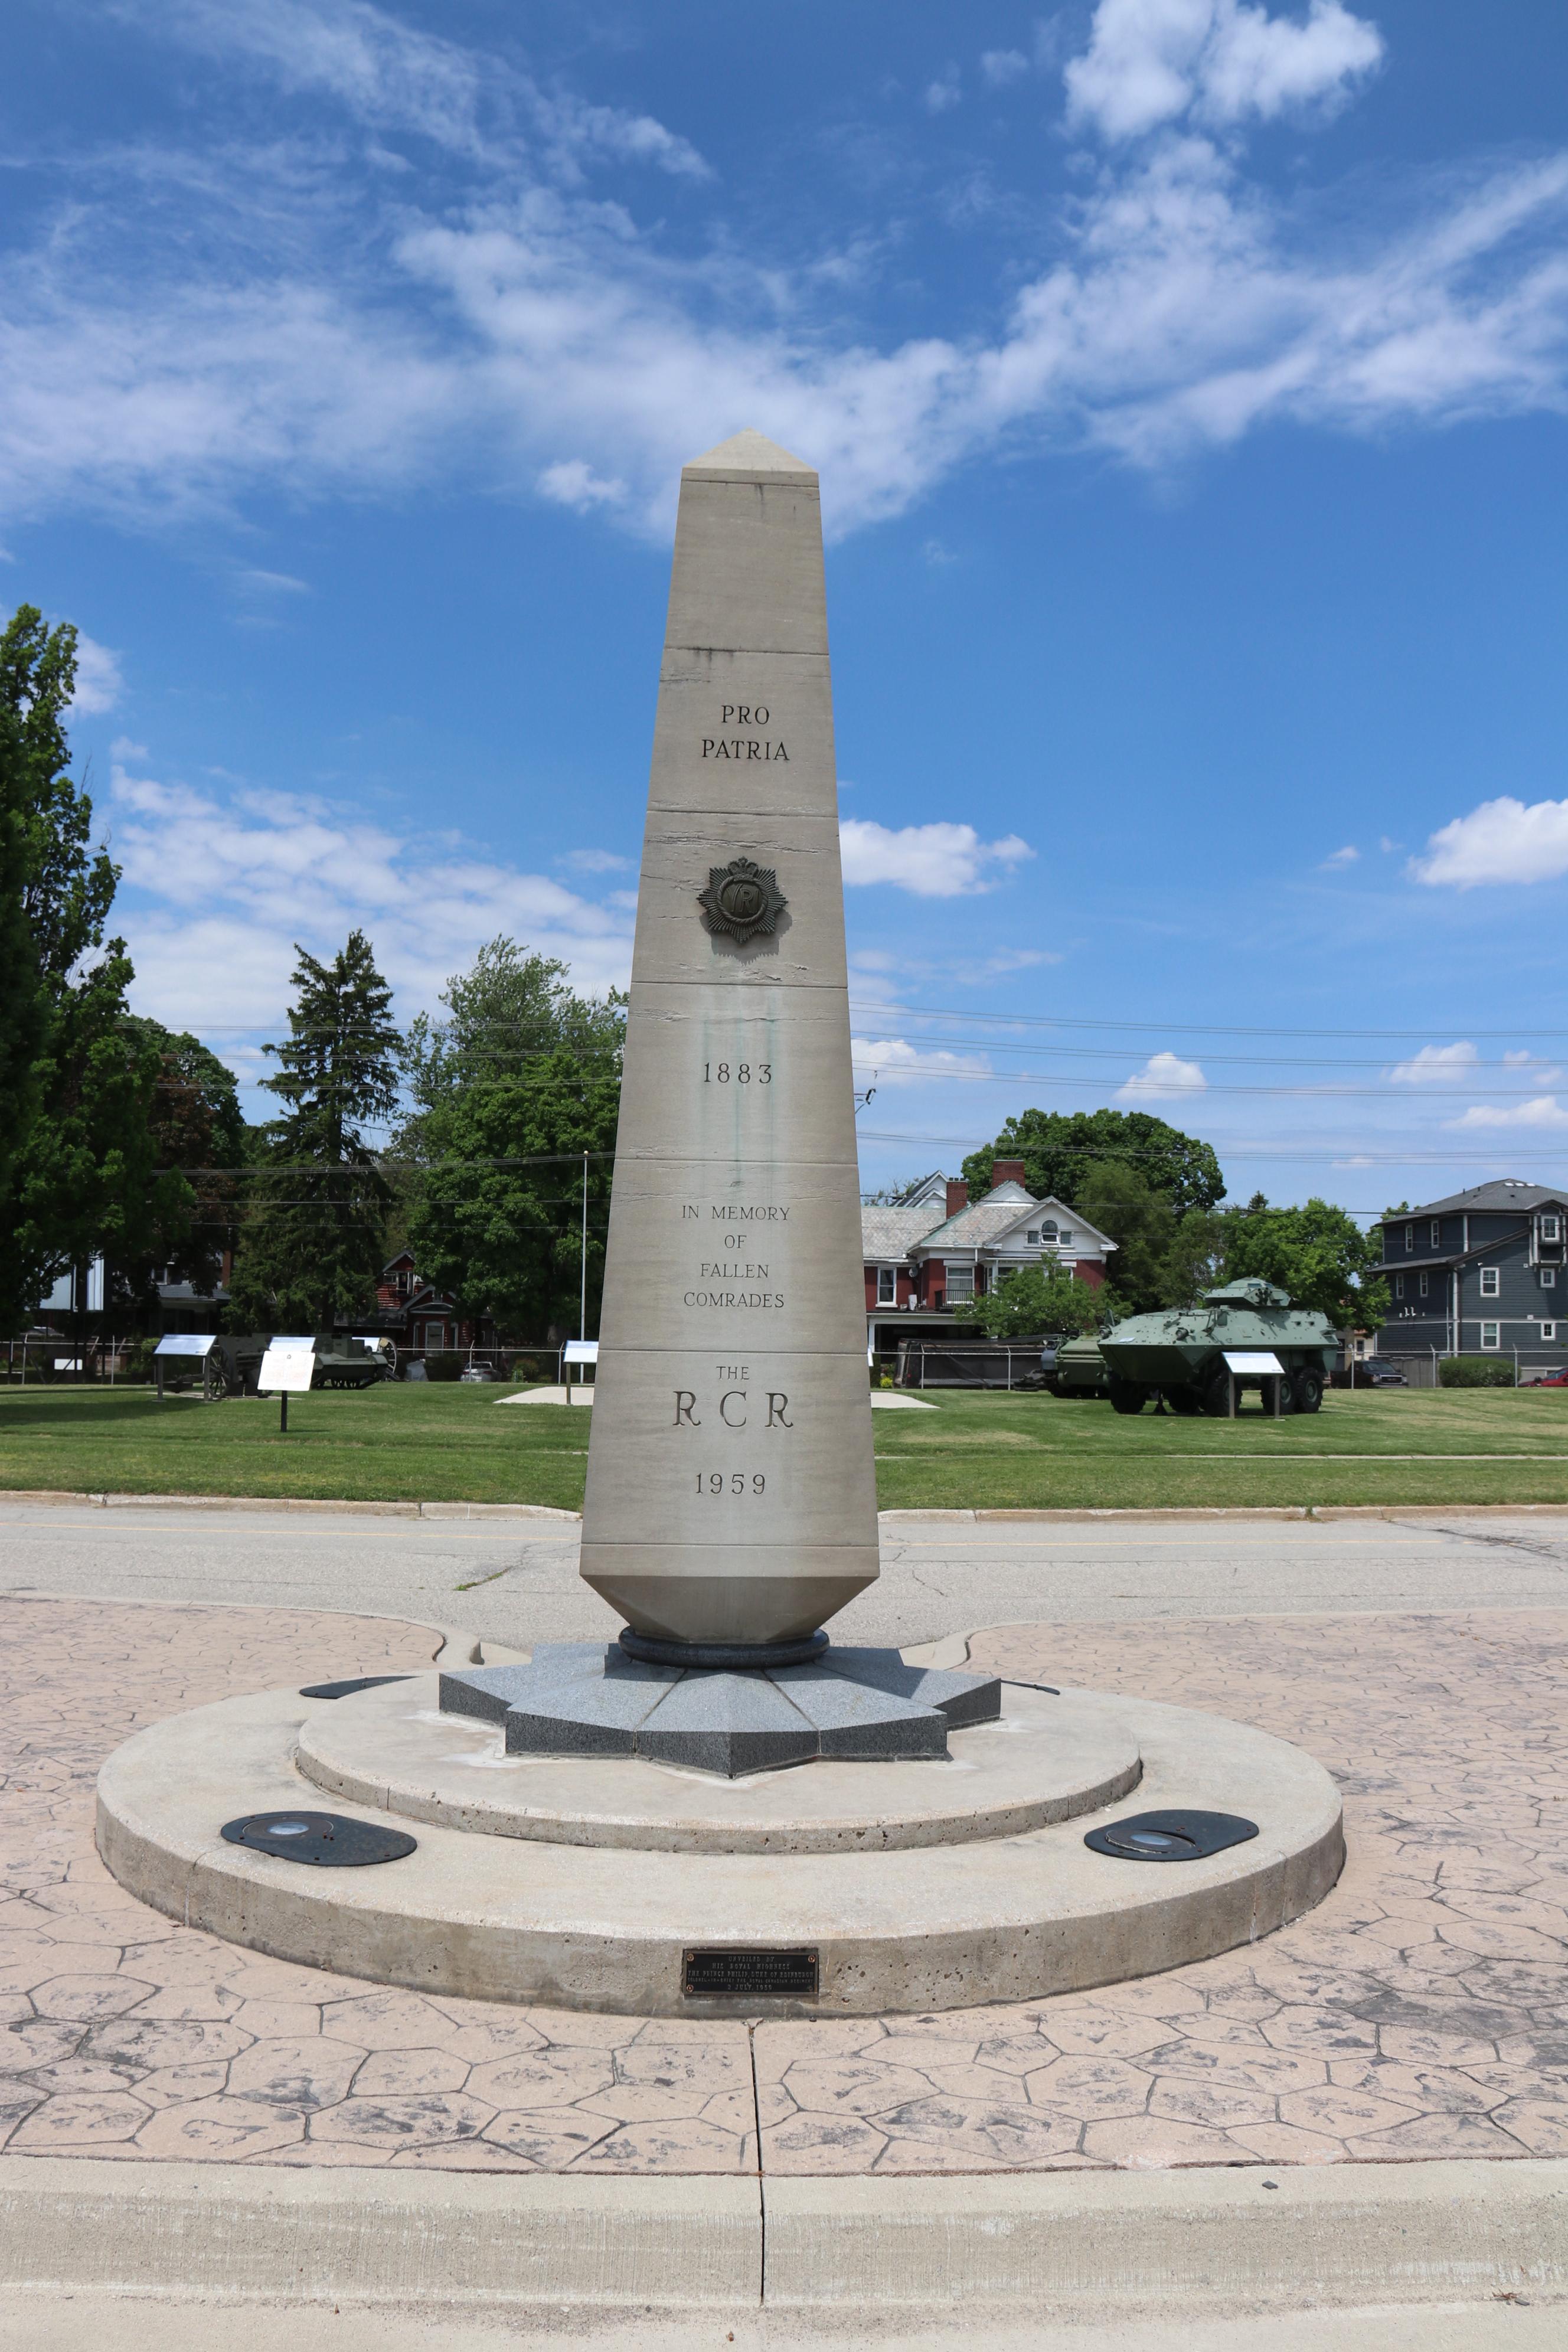 Regimental Memorial (Cenotaph) at The RCR Museum